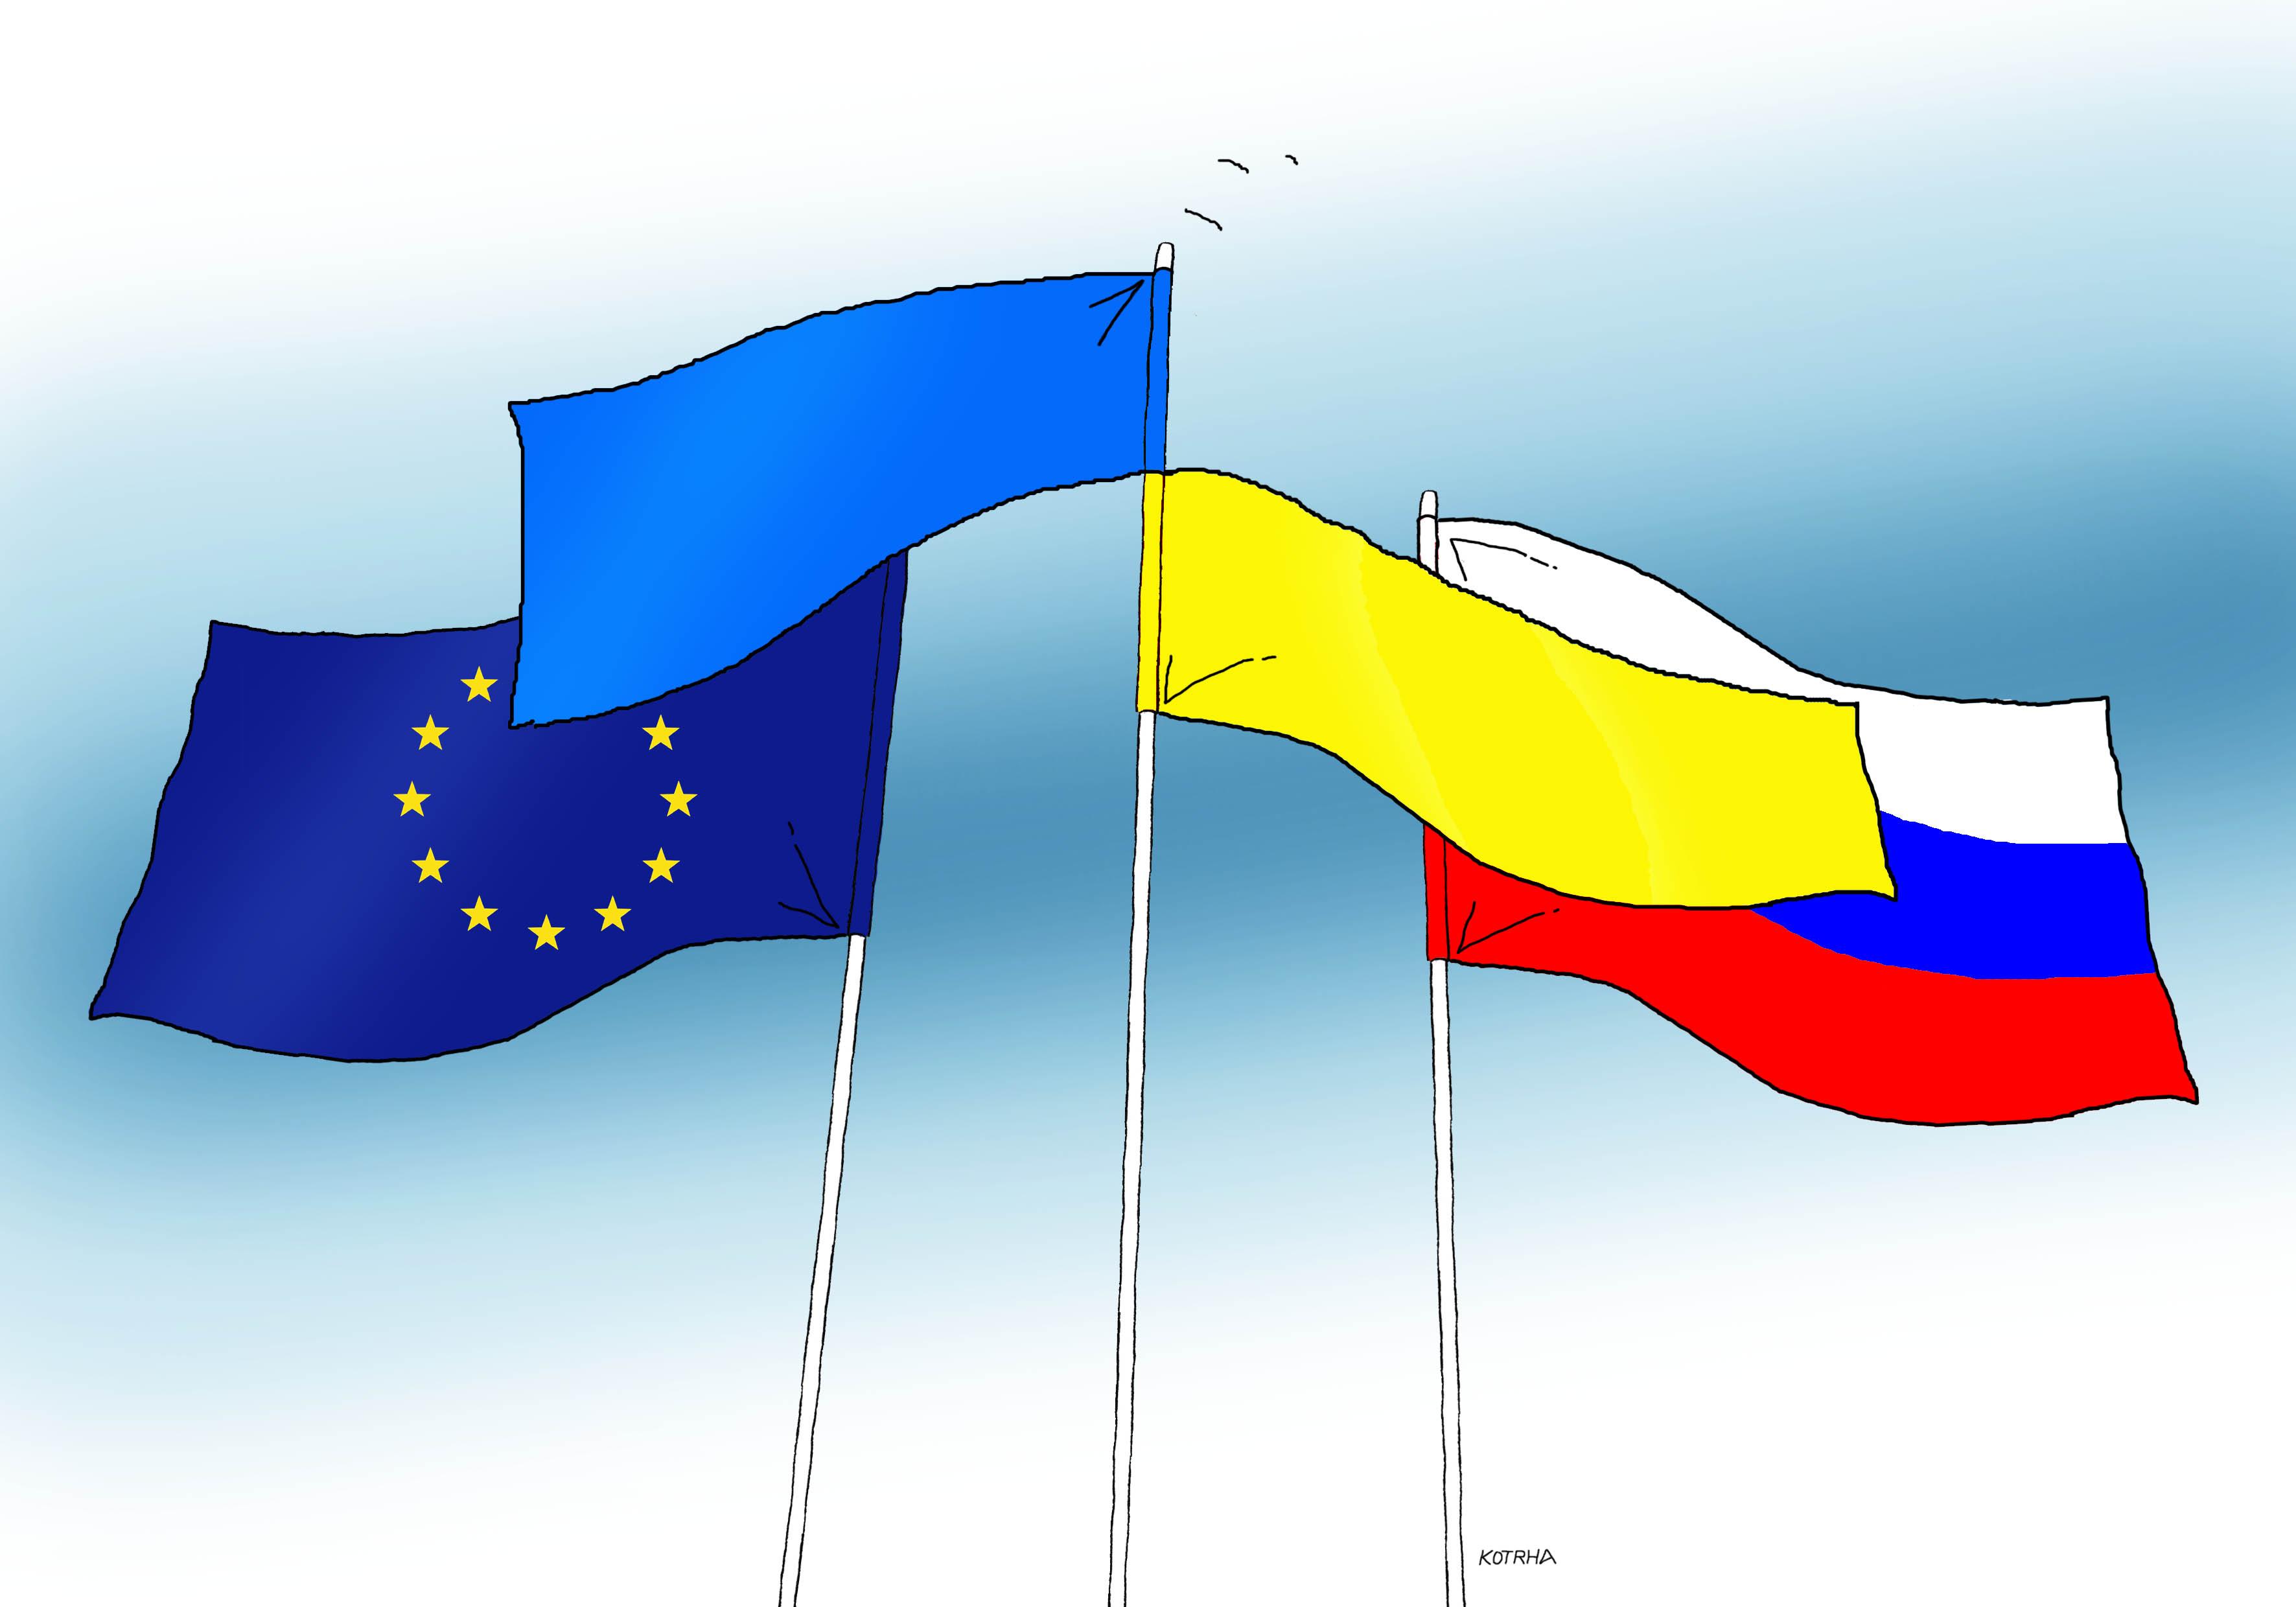 ucraineflag.jpg